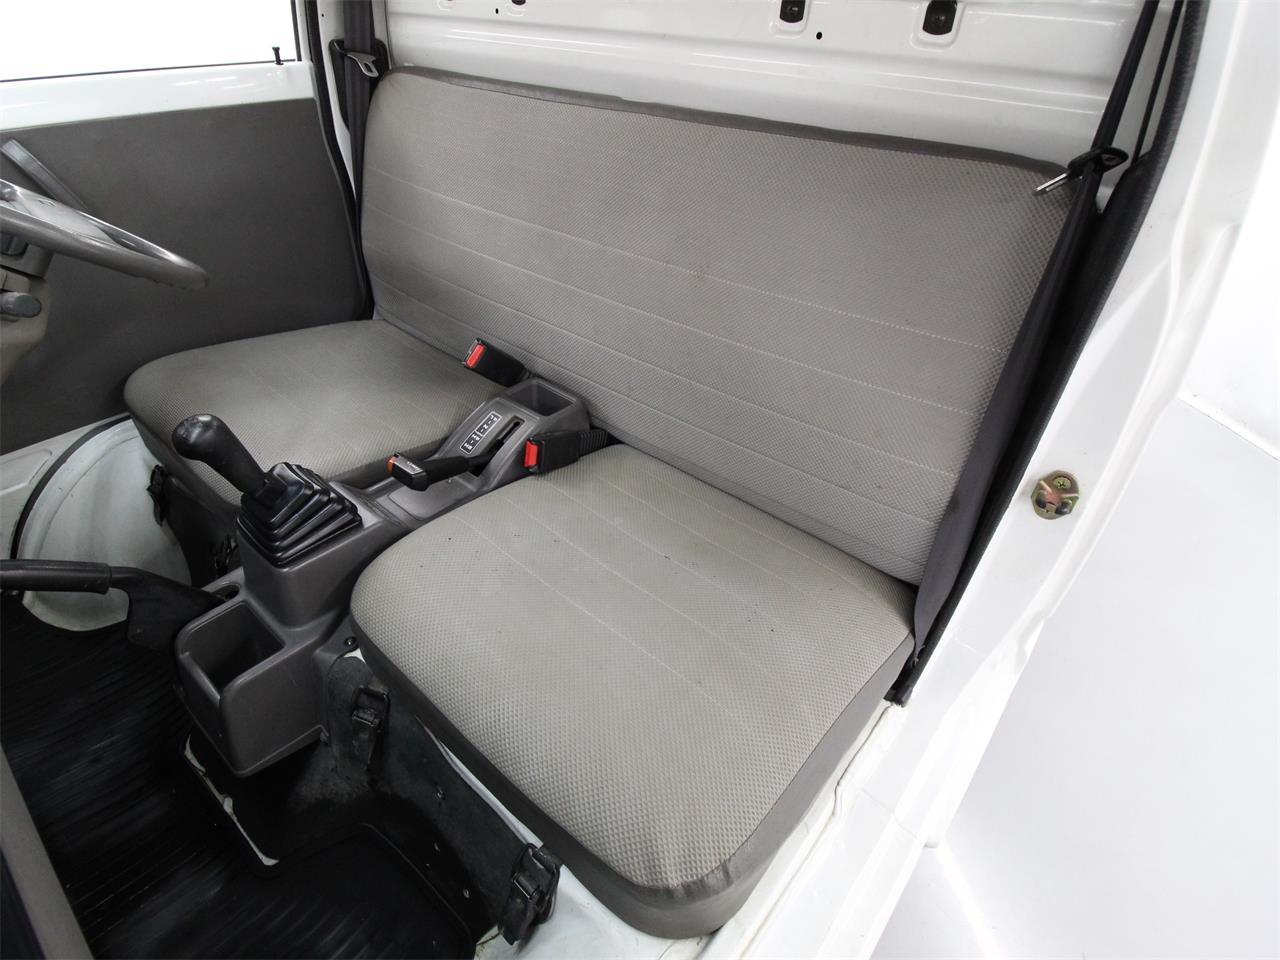 1991 Suzuki Carry (CC-1293248) for sale in Christiansburg, Virginia